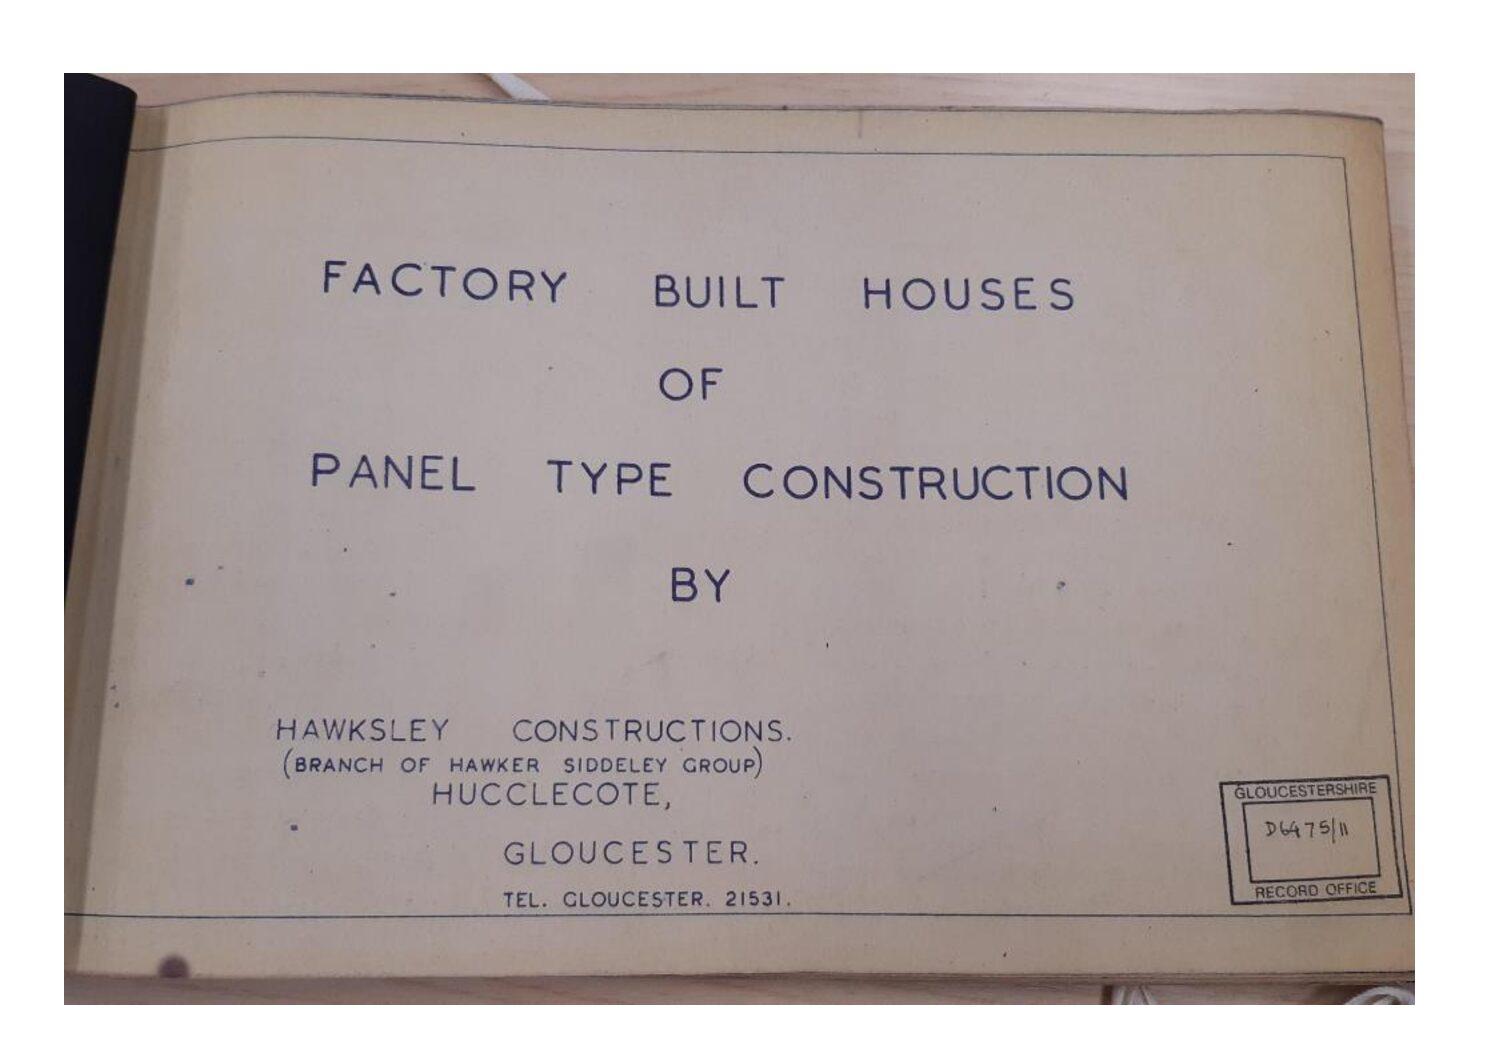 Hawksley BL8 construction manual